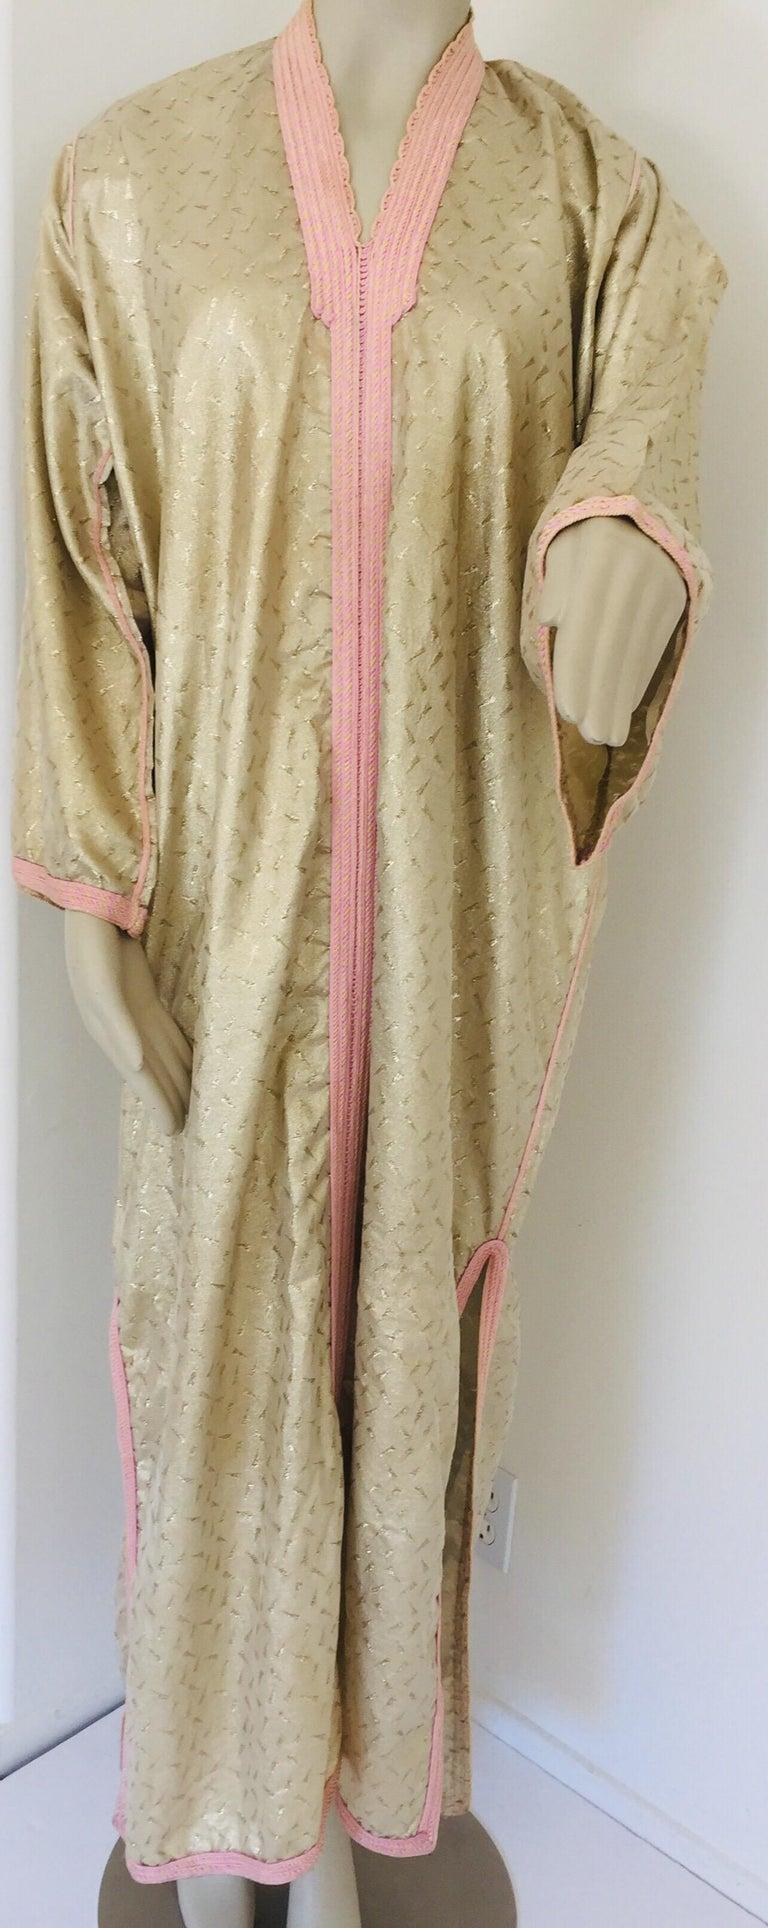 Brocade 1970s Metallic Gold Moroccan Caftan, Kaftan Maxi Dress North Africa, Morocco For Sale